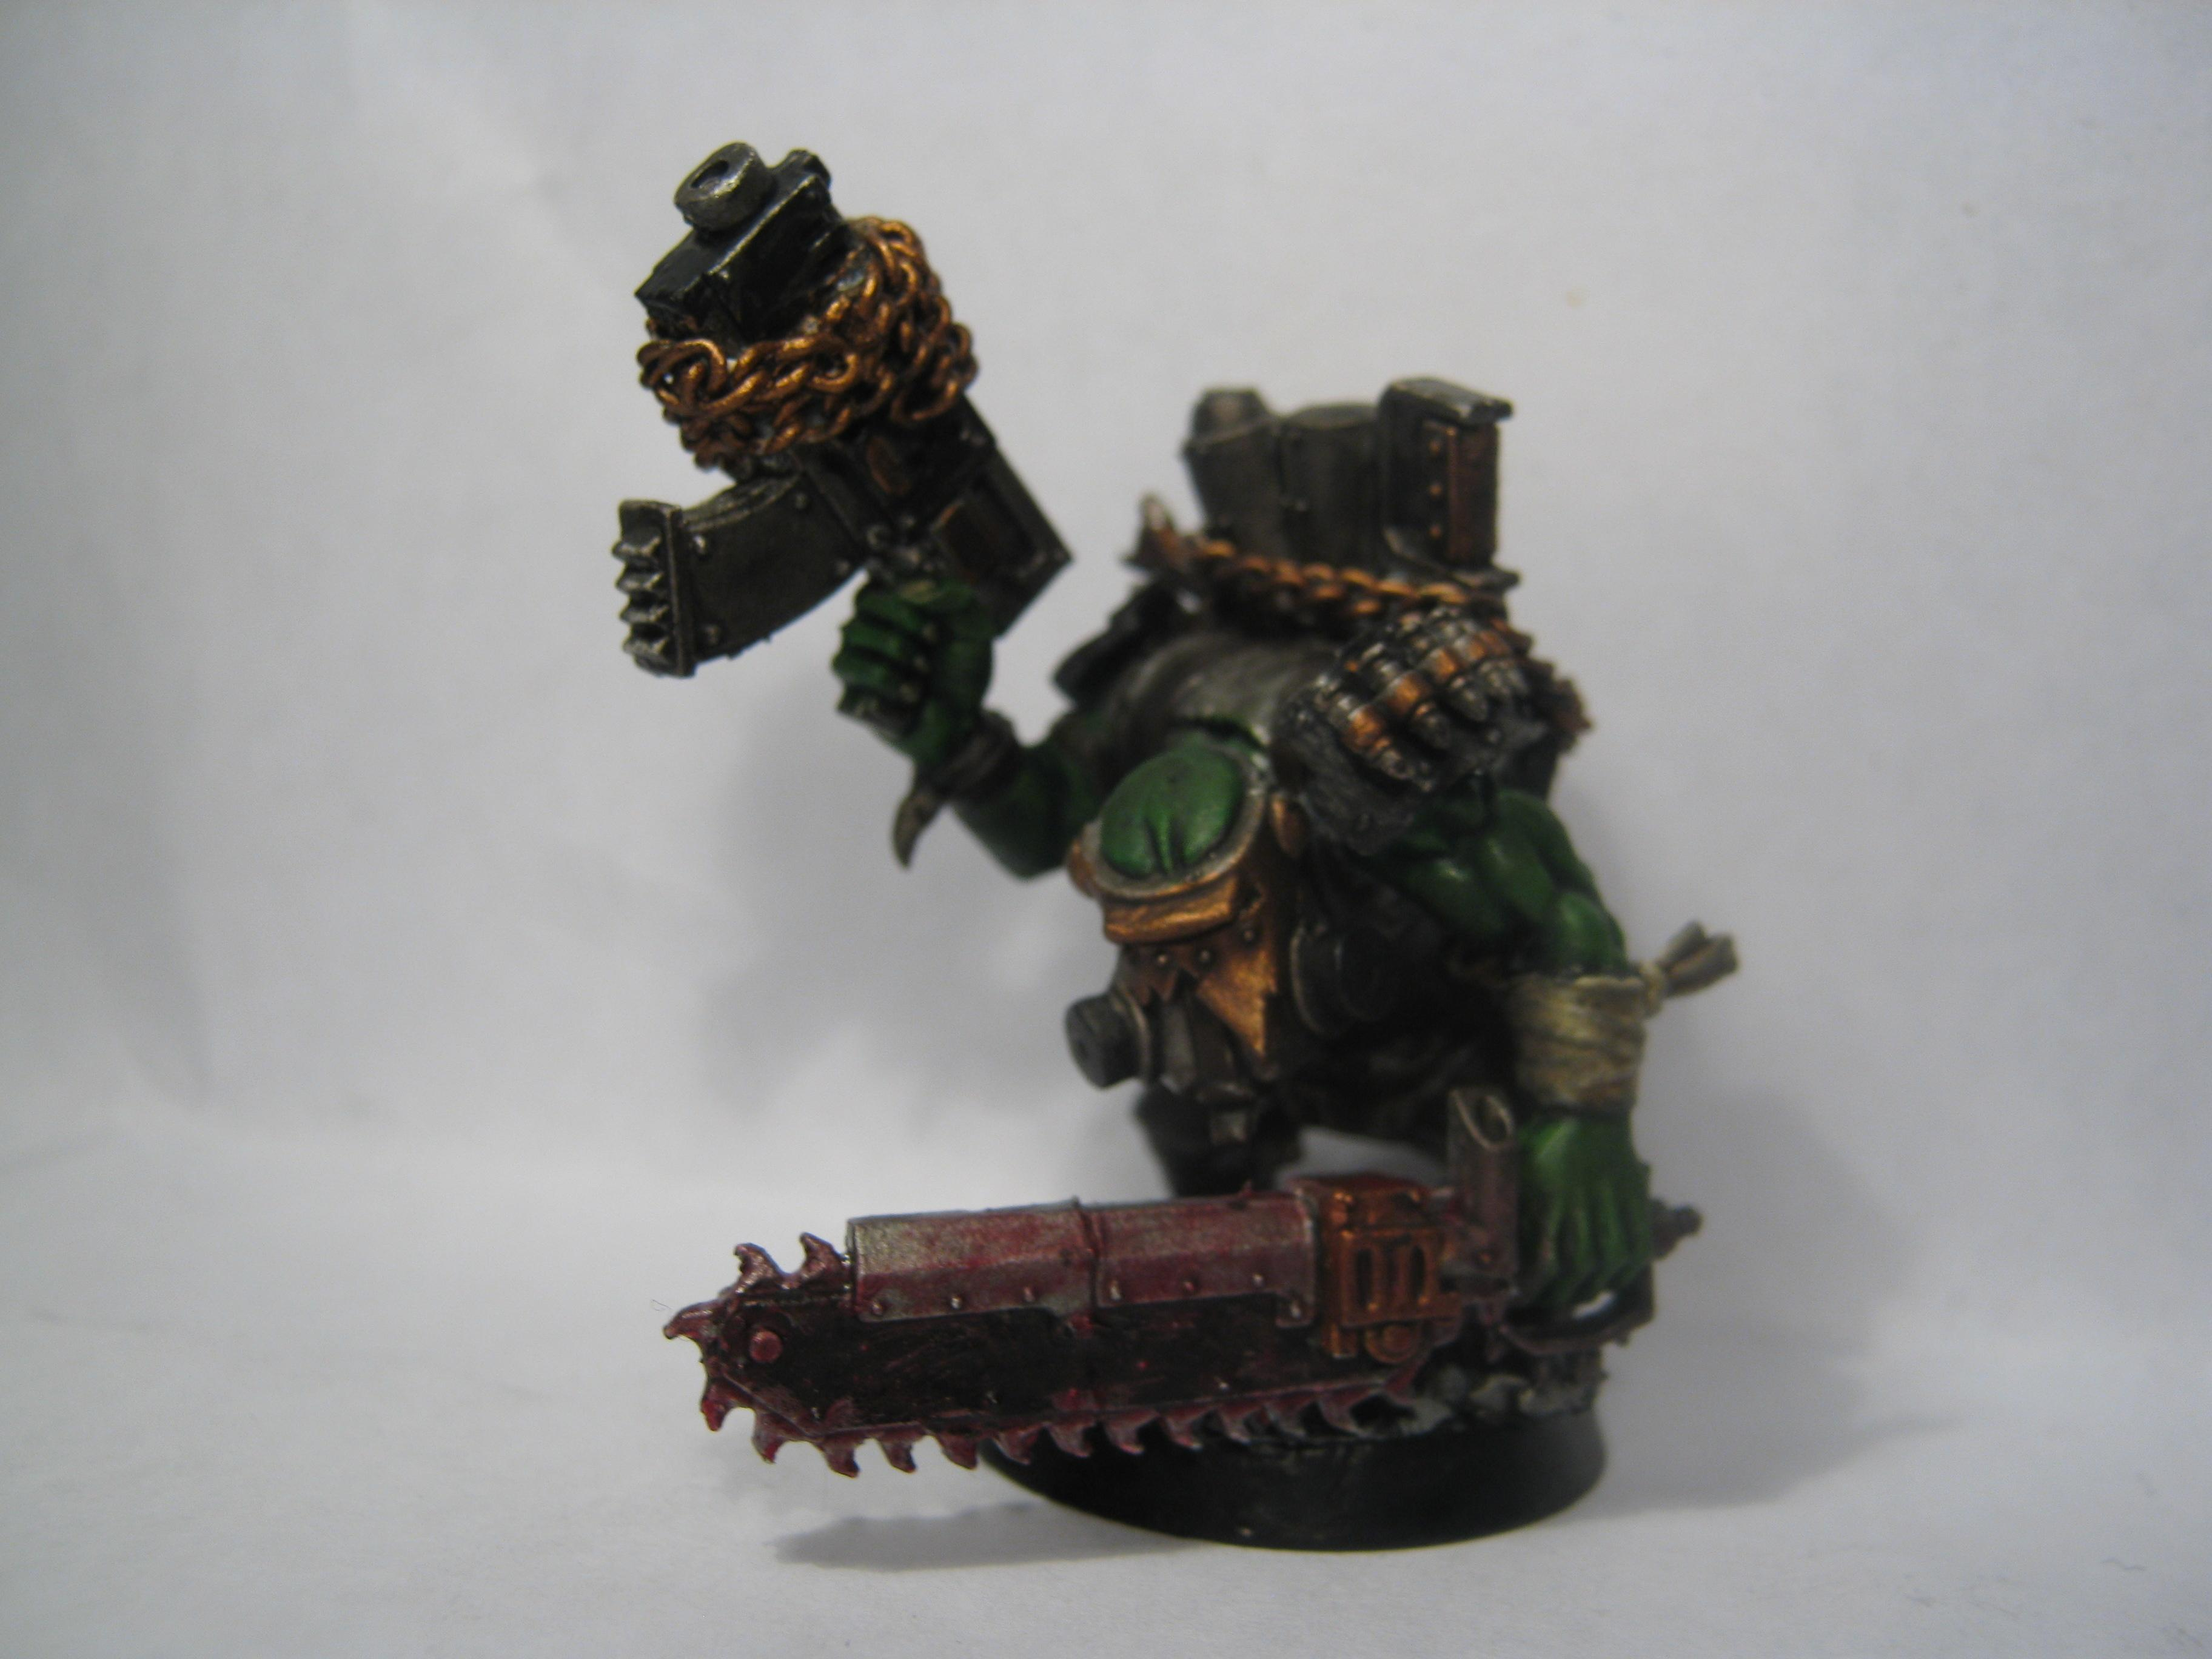 Gas Mask, Gore, Kommando, Orks, Waaagh Dakka, Warhammer 40,000